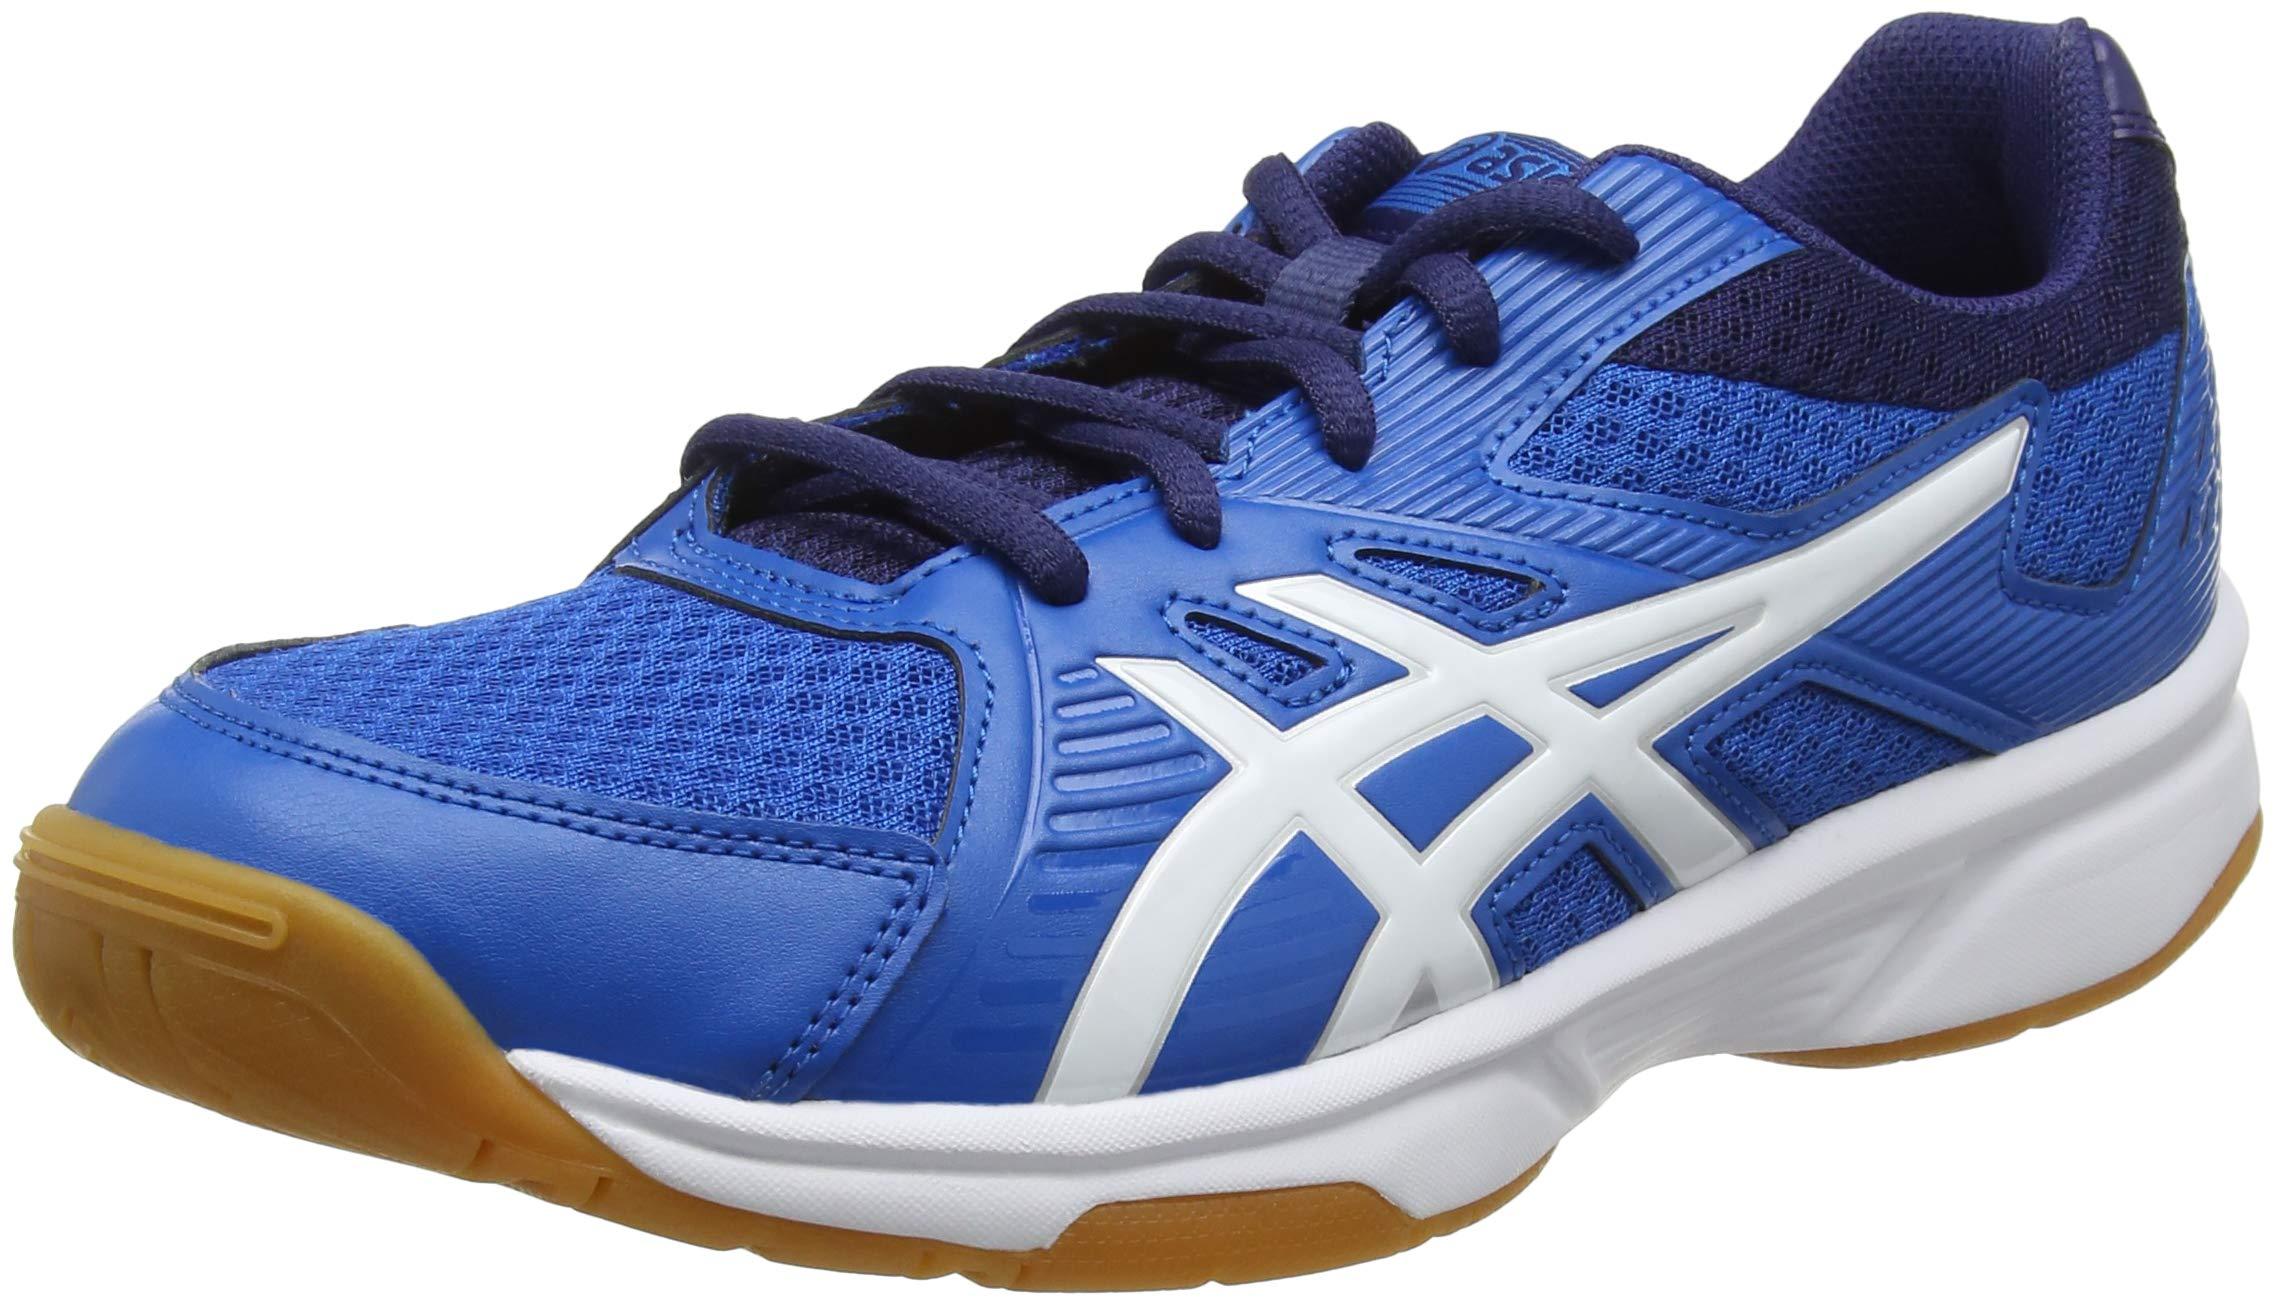 ASICS Men's Upcourt 3 Squash Shoes